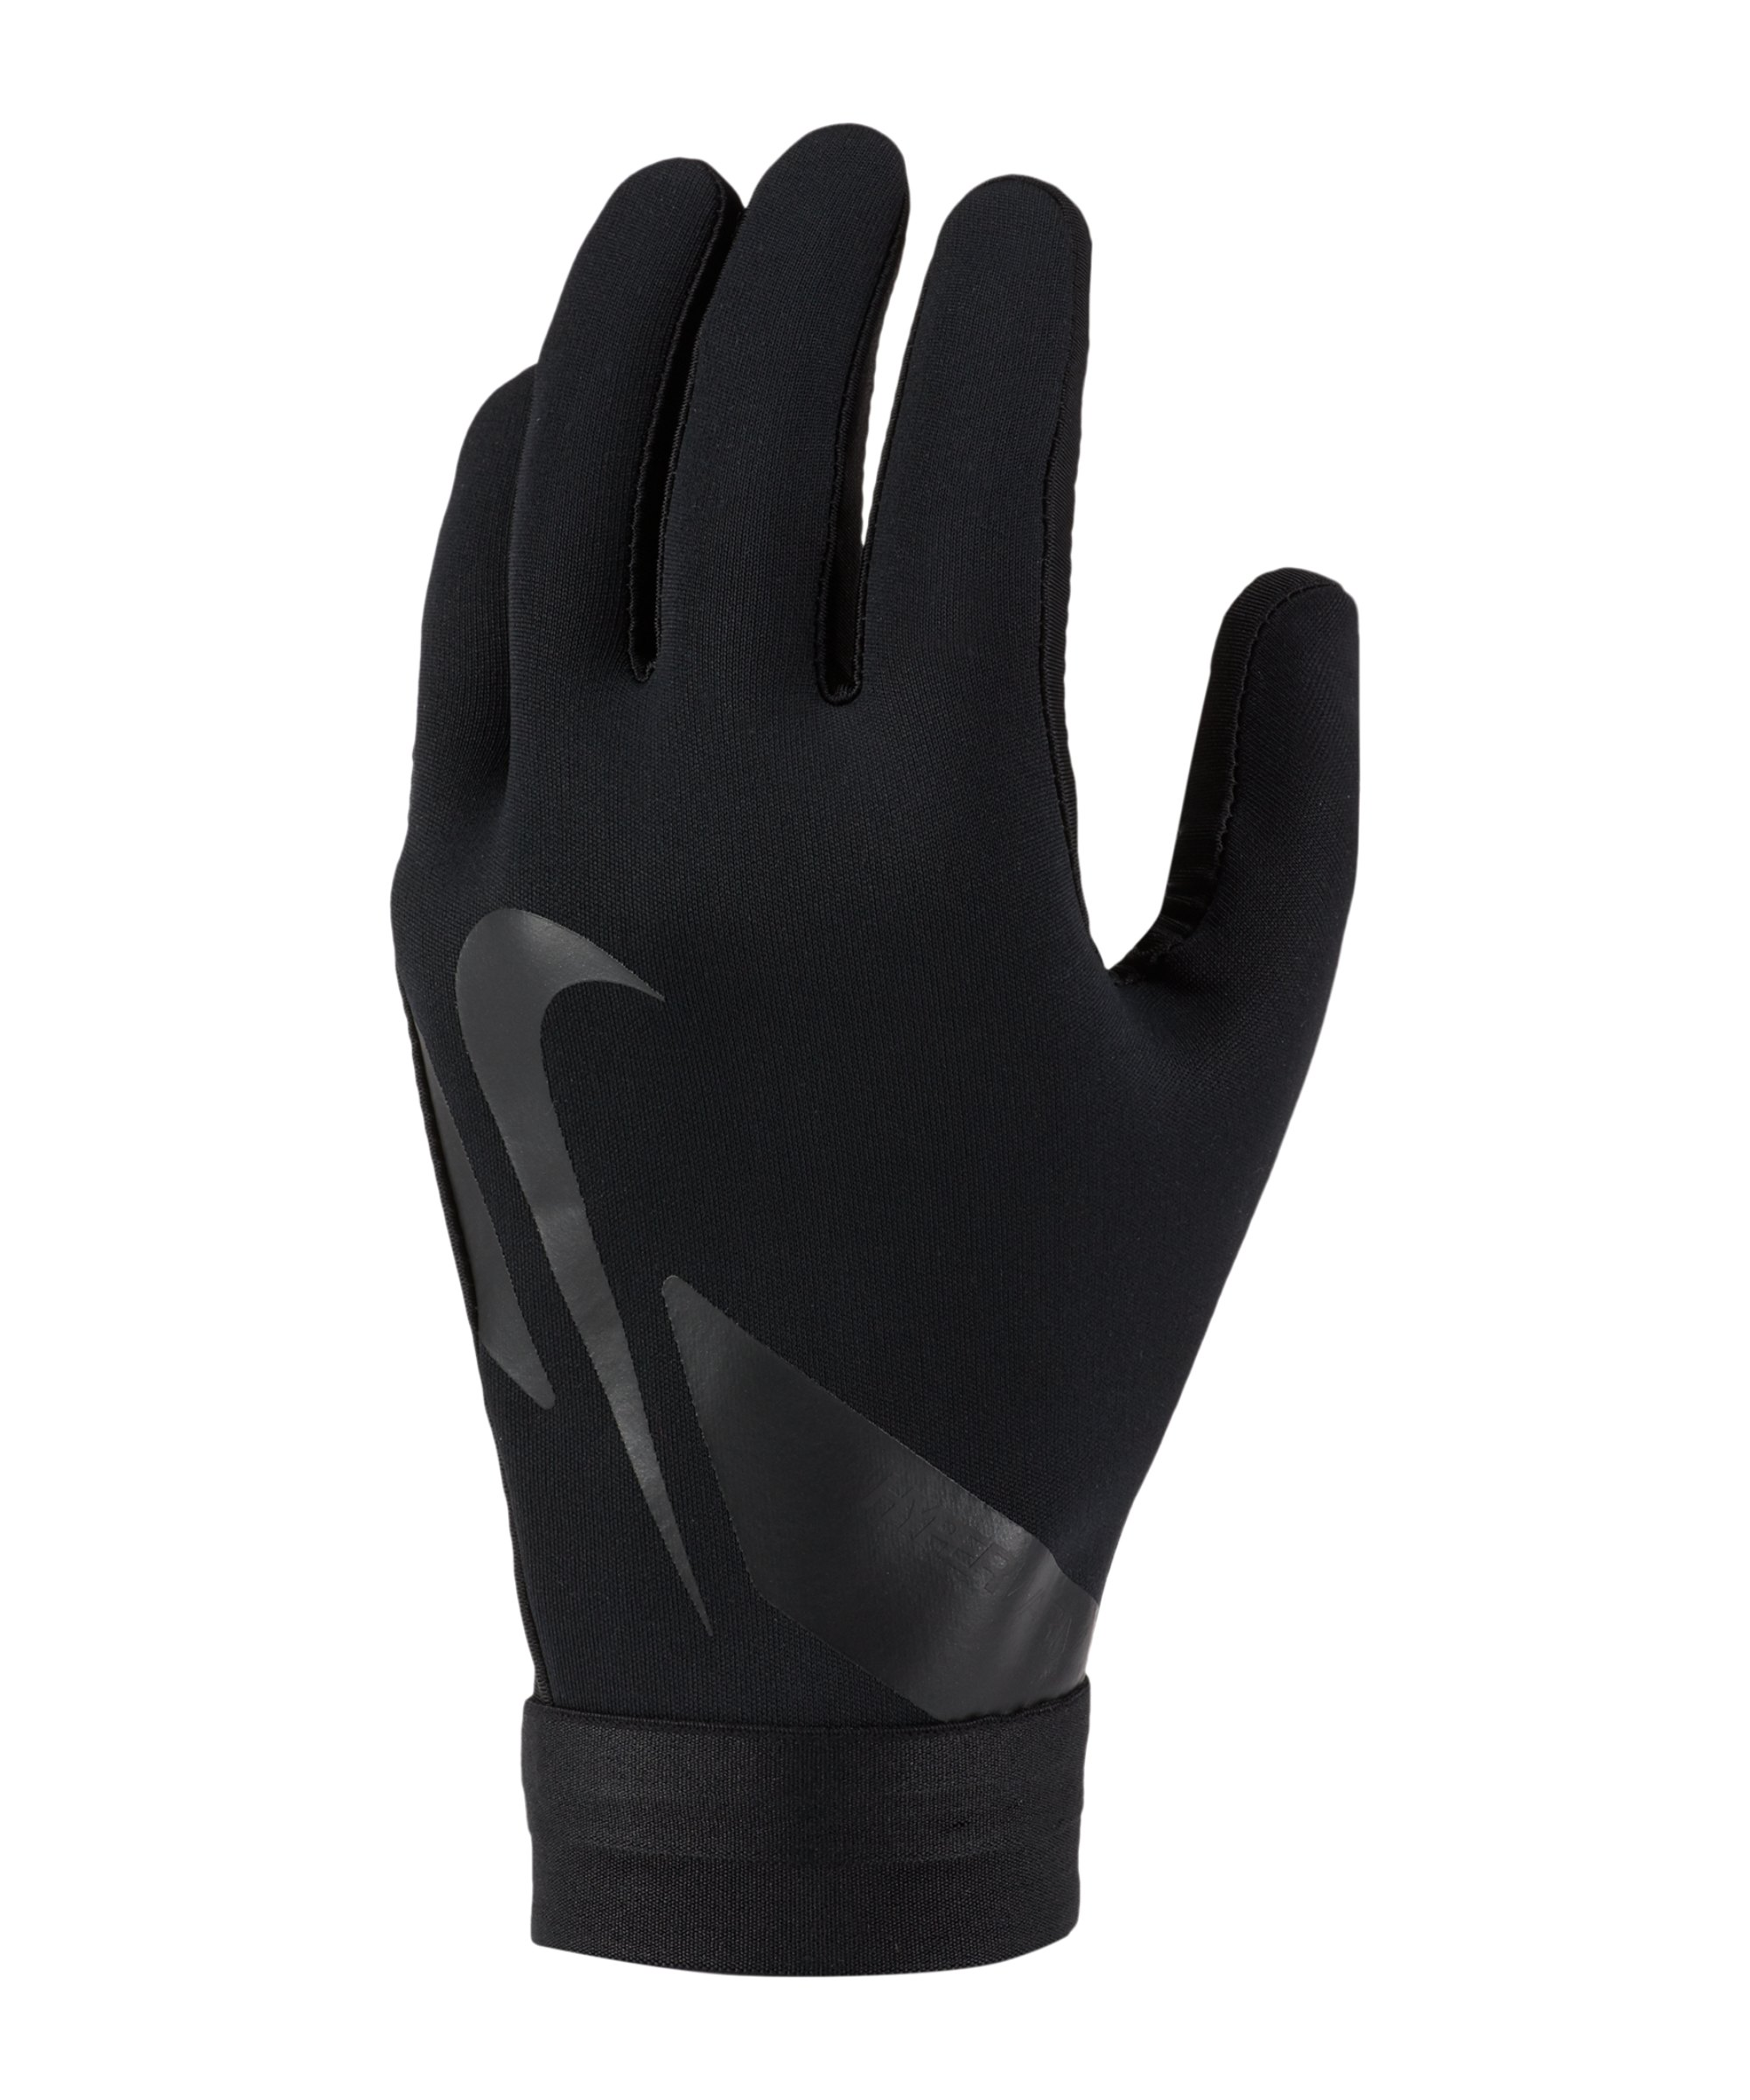 Nike Academy Hyperwarm Feldspielerhandschuhe F011 - schwarz